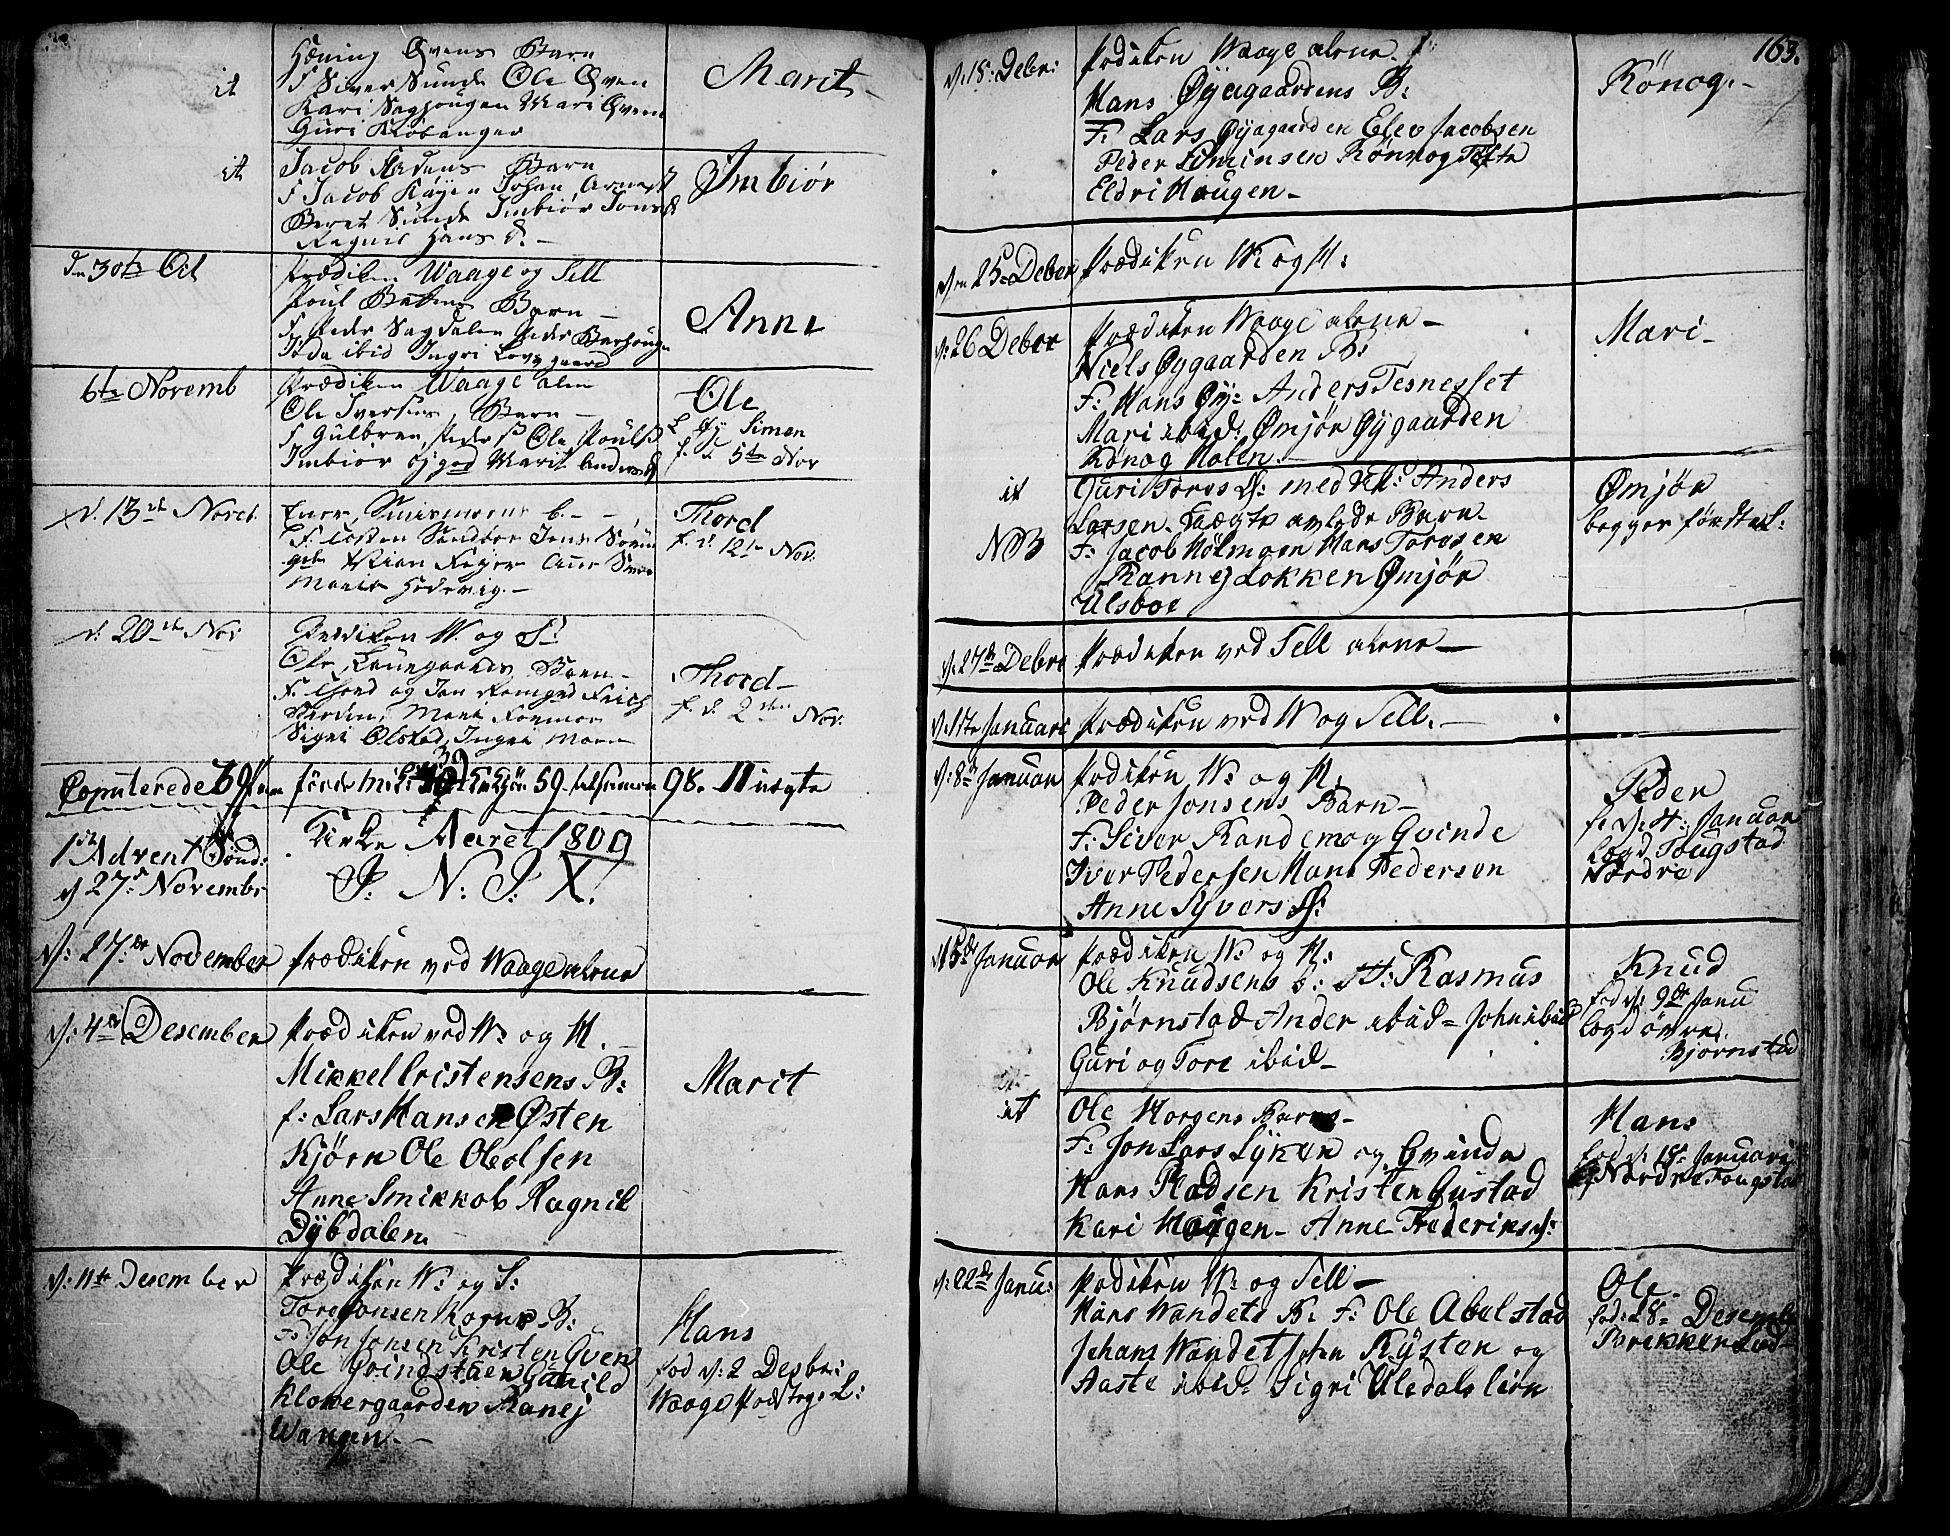 SAH, Vågå prestekontor, Ministerialbok nr. 1, 1739-1810, s. 163